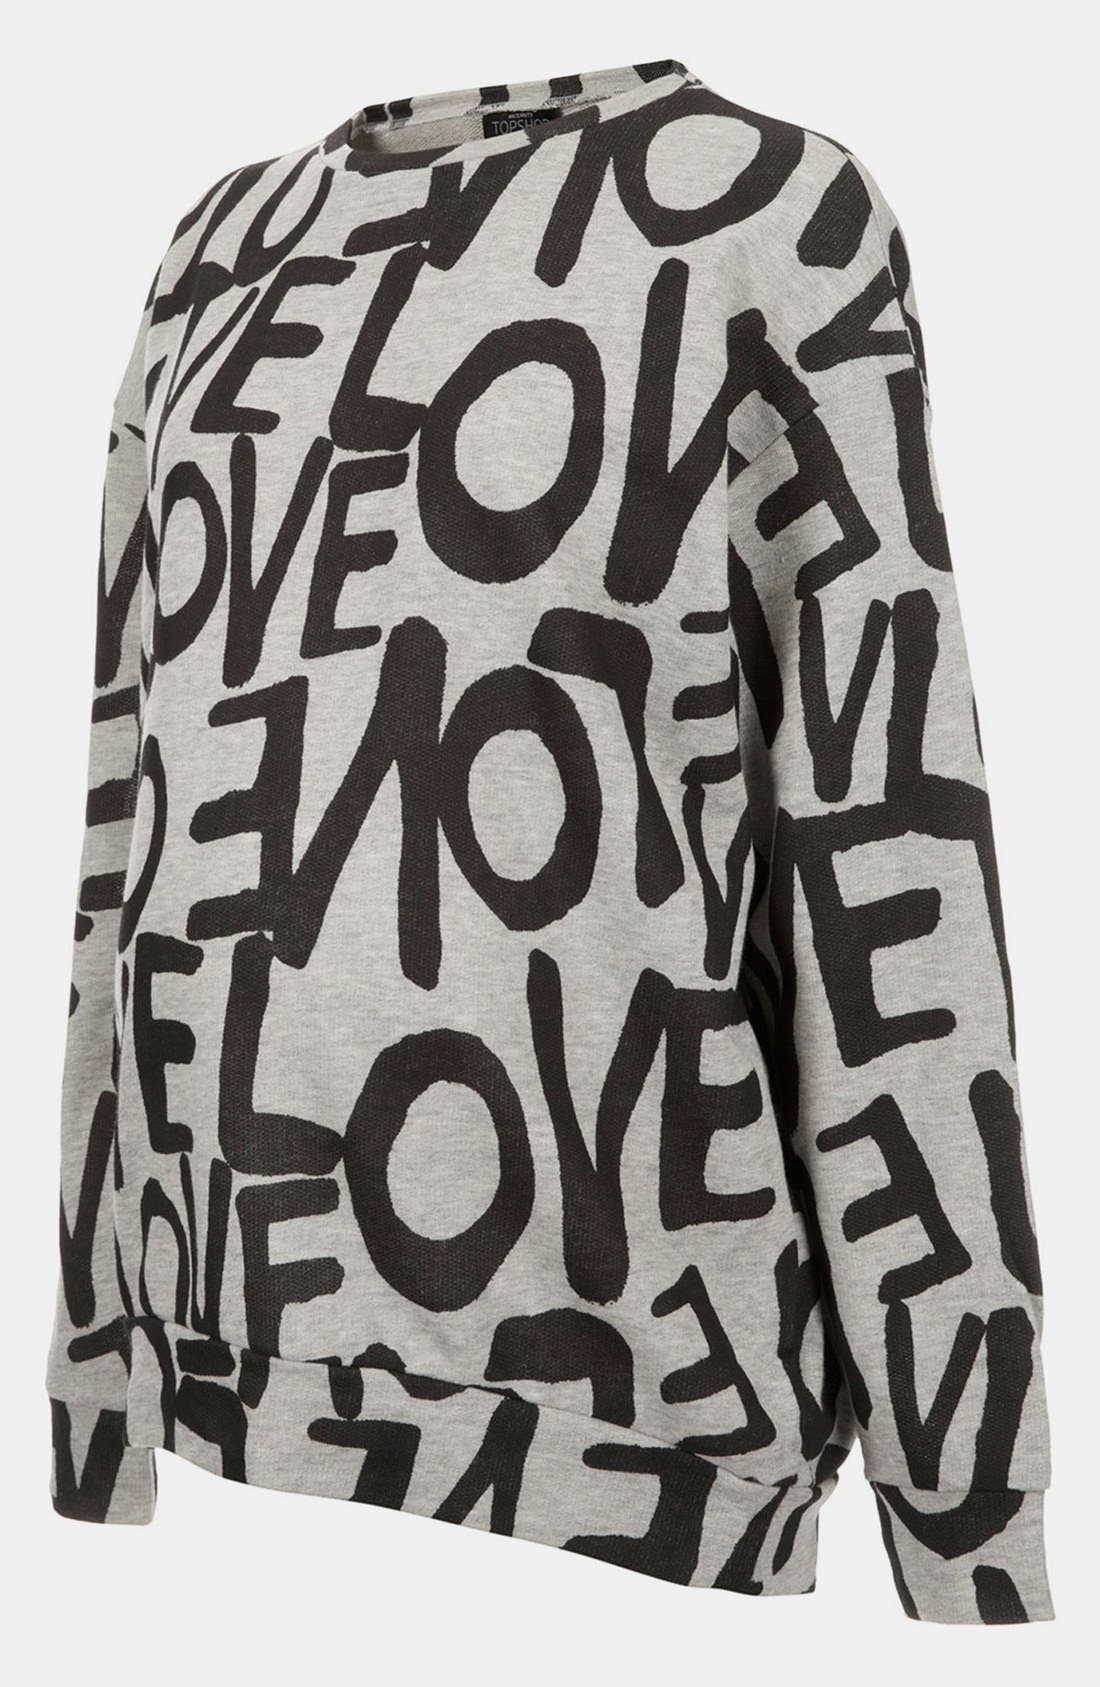 Alternate Image 1 Selected - Topshop 'Love' Maternity Sweatshirt